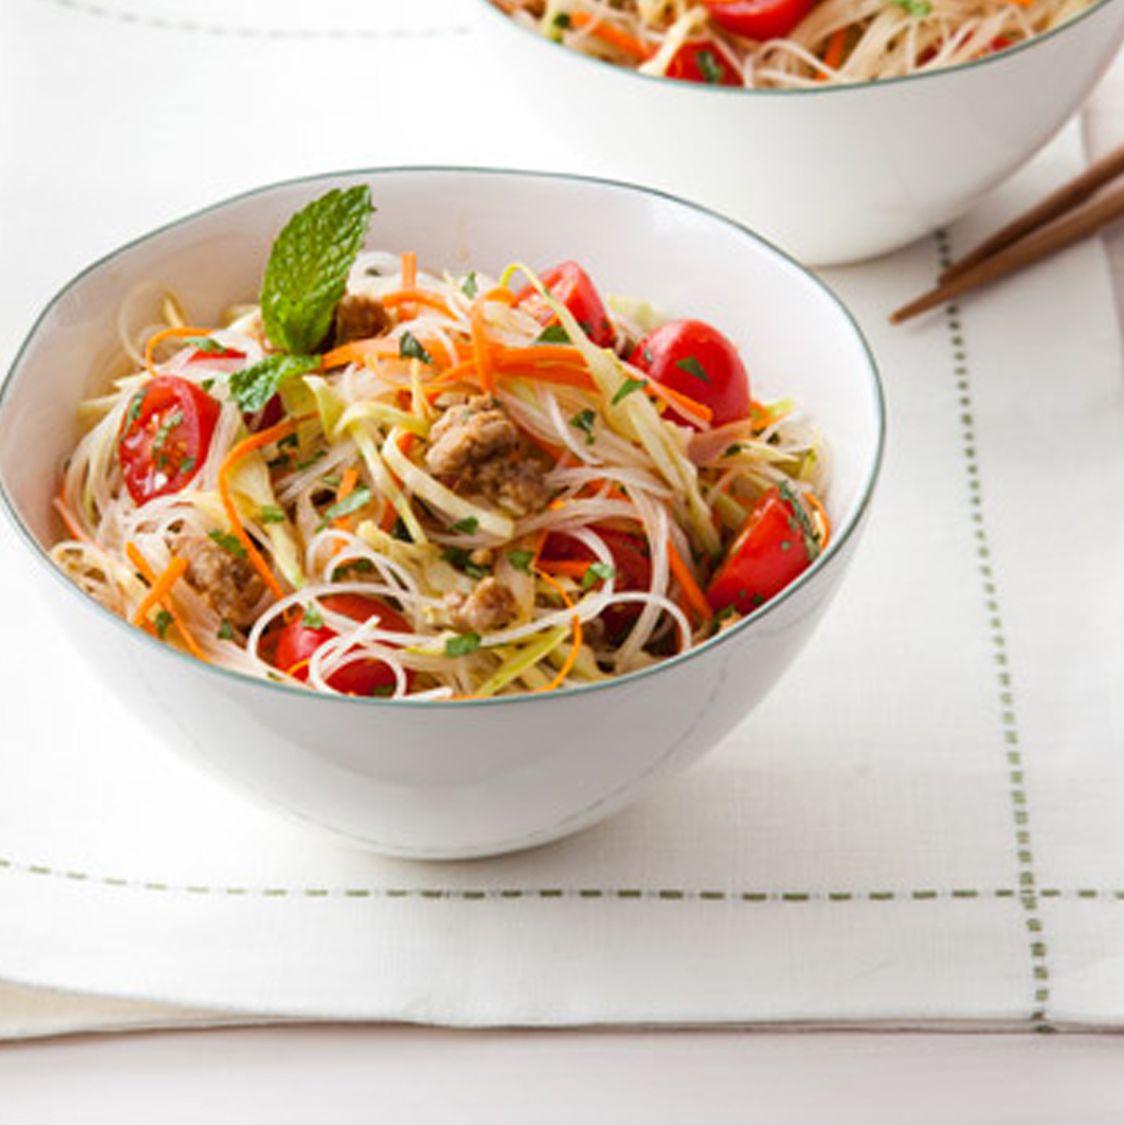 Ground Pork Recipes - Spicy Thai Noodle Salad